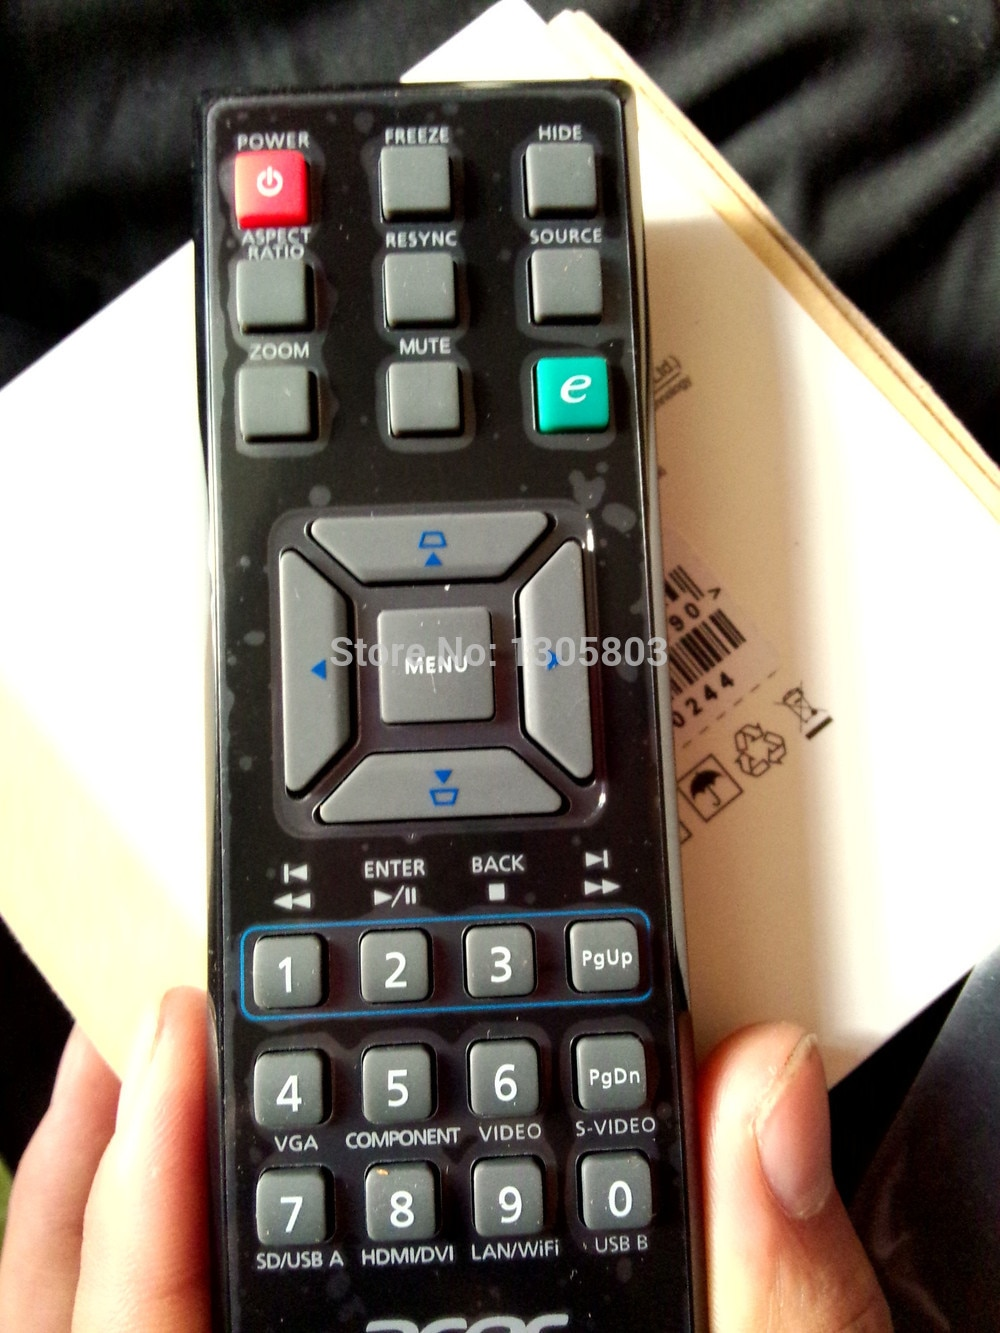 Original control remoto de proyector para Acer X112 X1163 P1163 X1263 P1276 P1273 P1373